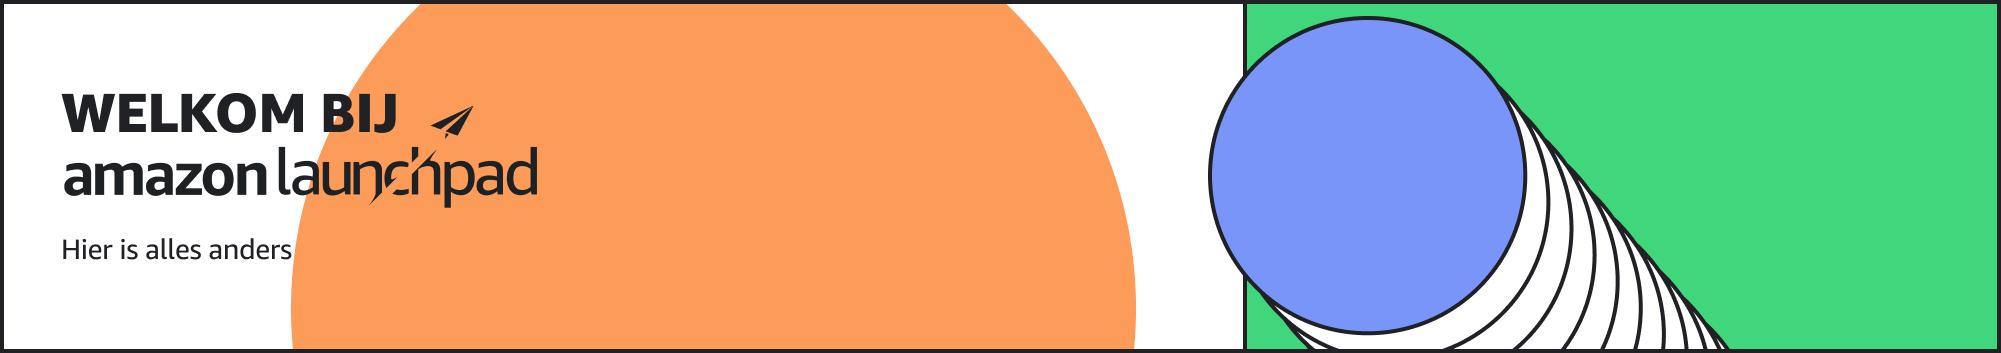 NL AL Launch SF desktop Top banner